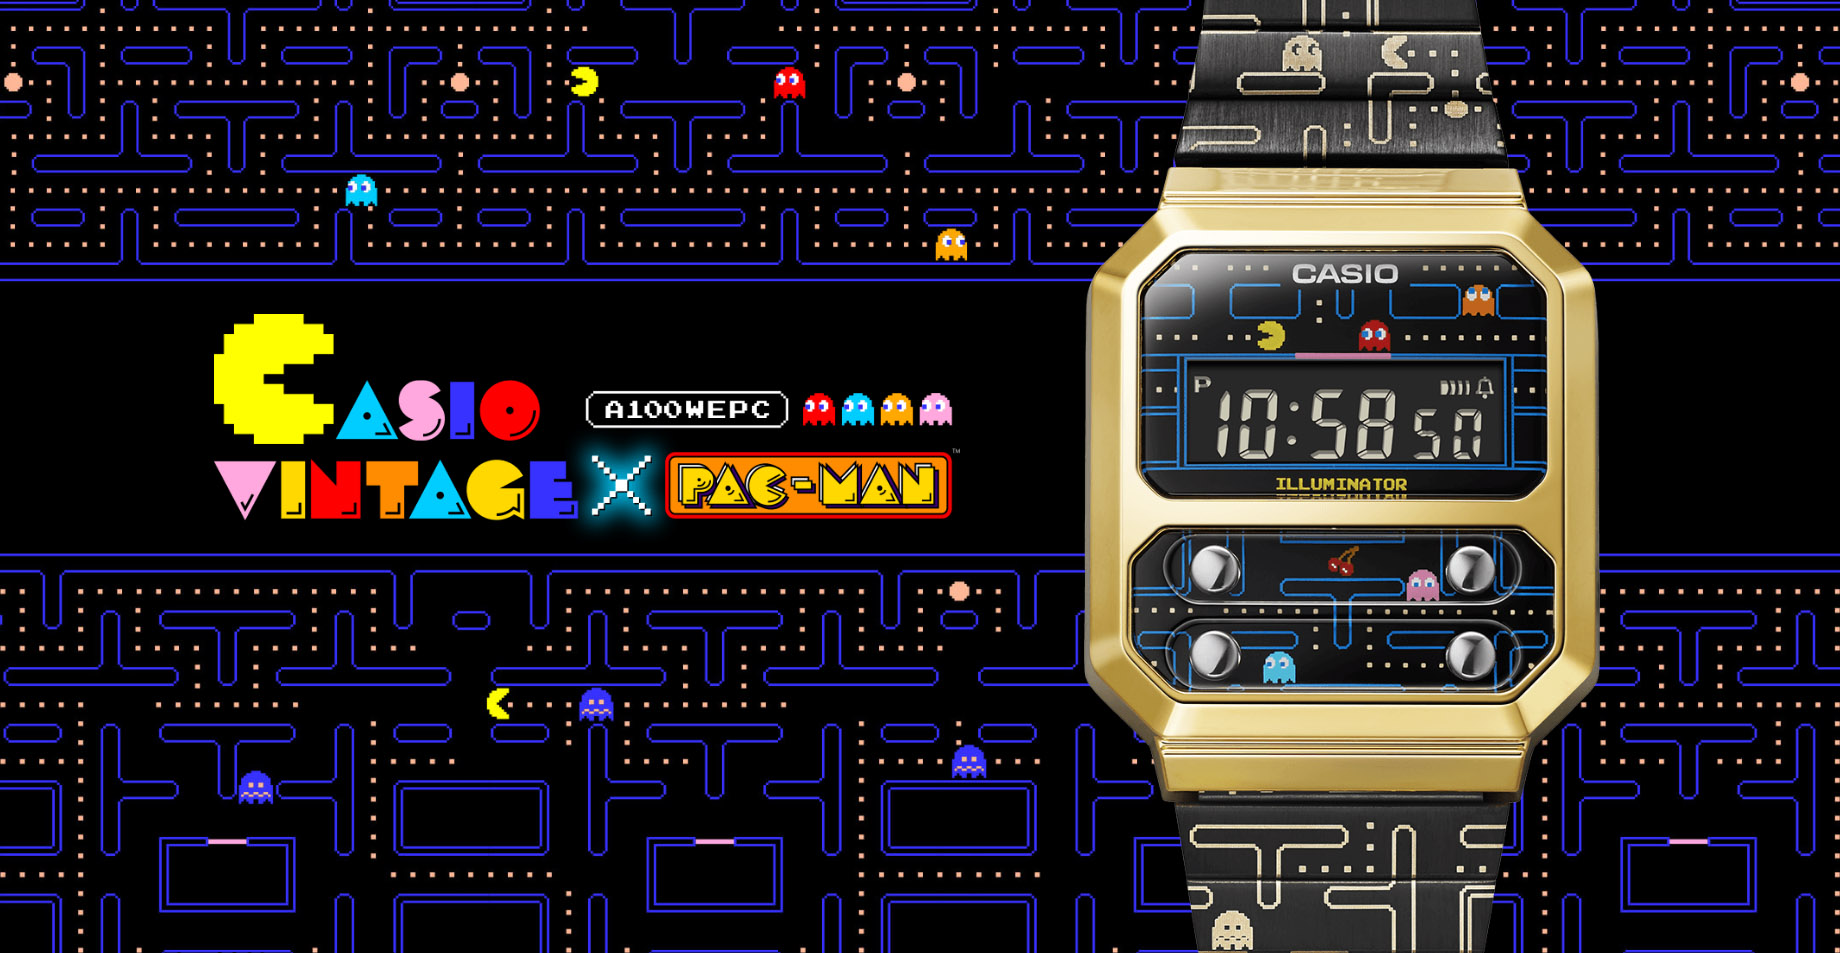 A100WEPC Pac-Man edition